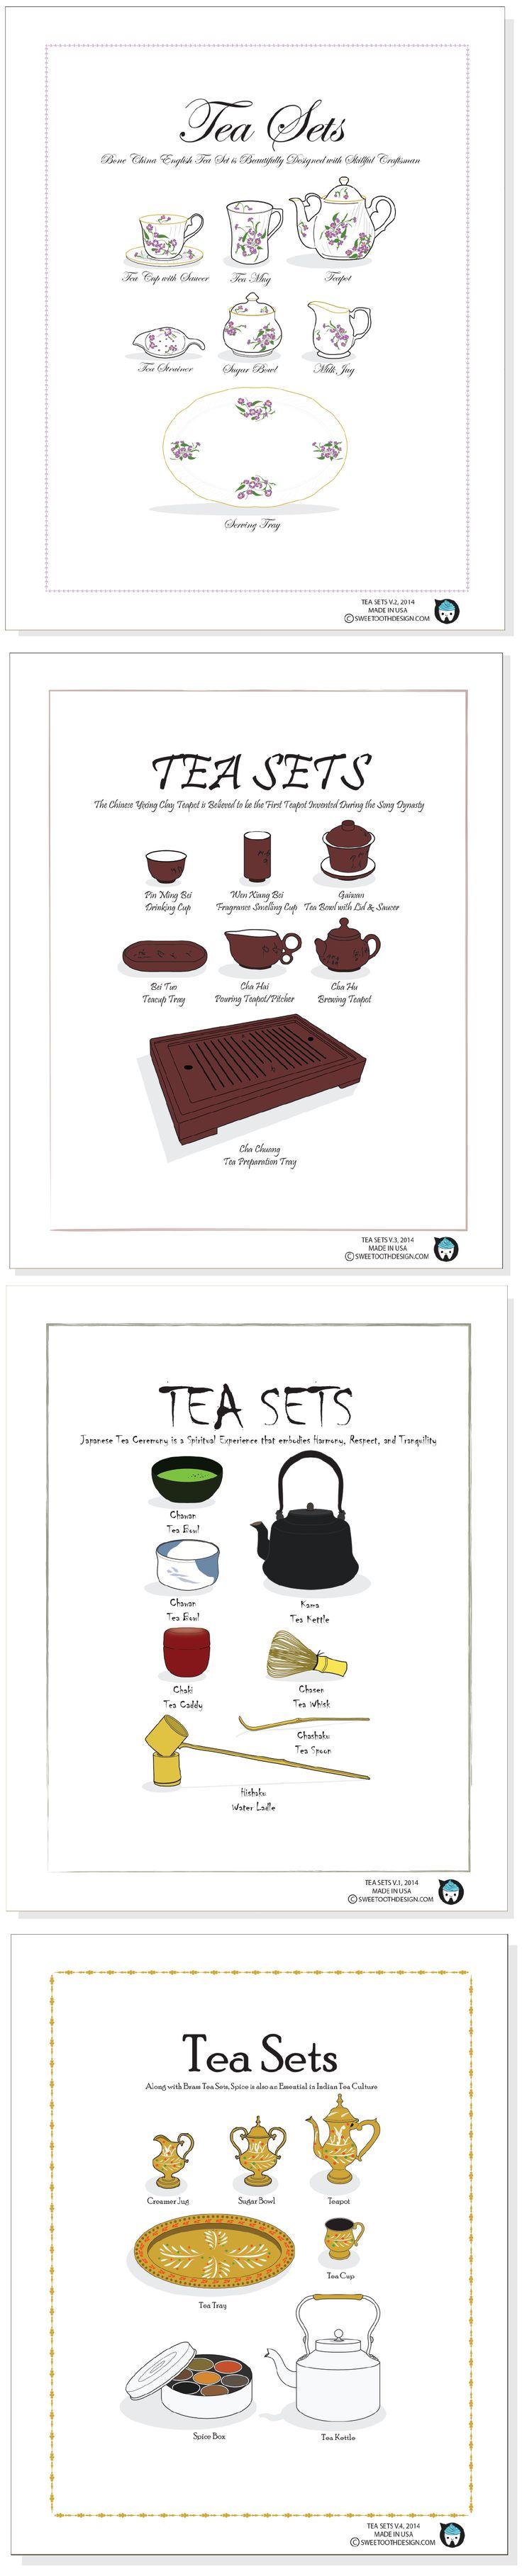 TEA SETS: English, Chinese, Japanese, and Indian Tea Sets